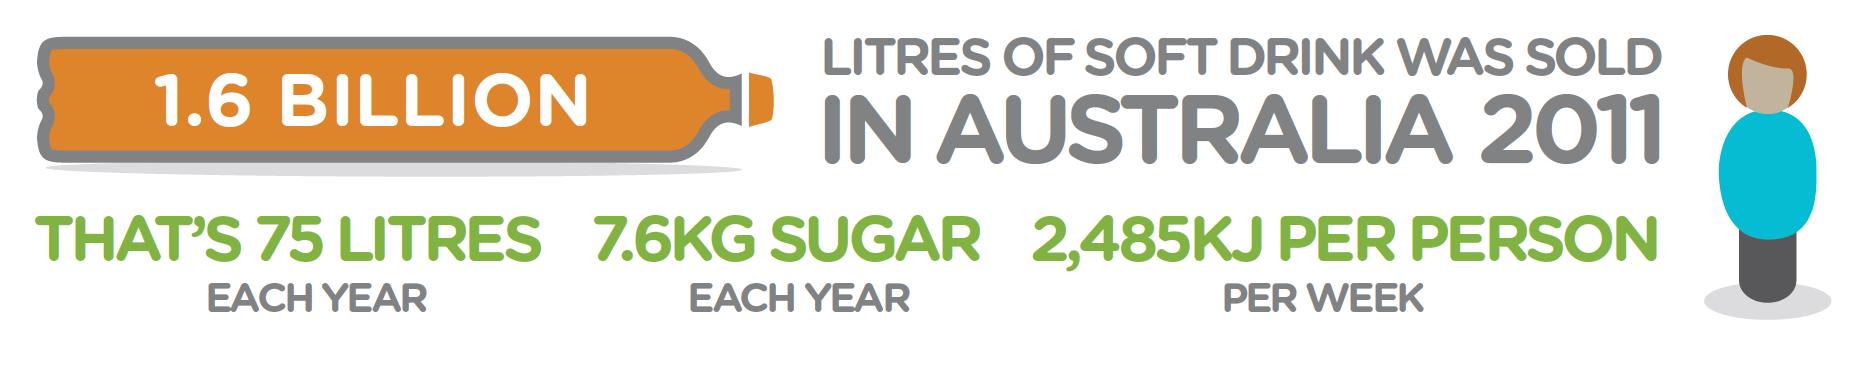 Image:Obesity: Sugar-sweetened Beverages, Obesity & Health. Australian National Preventive Health Agency (2014)